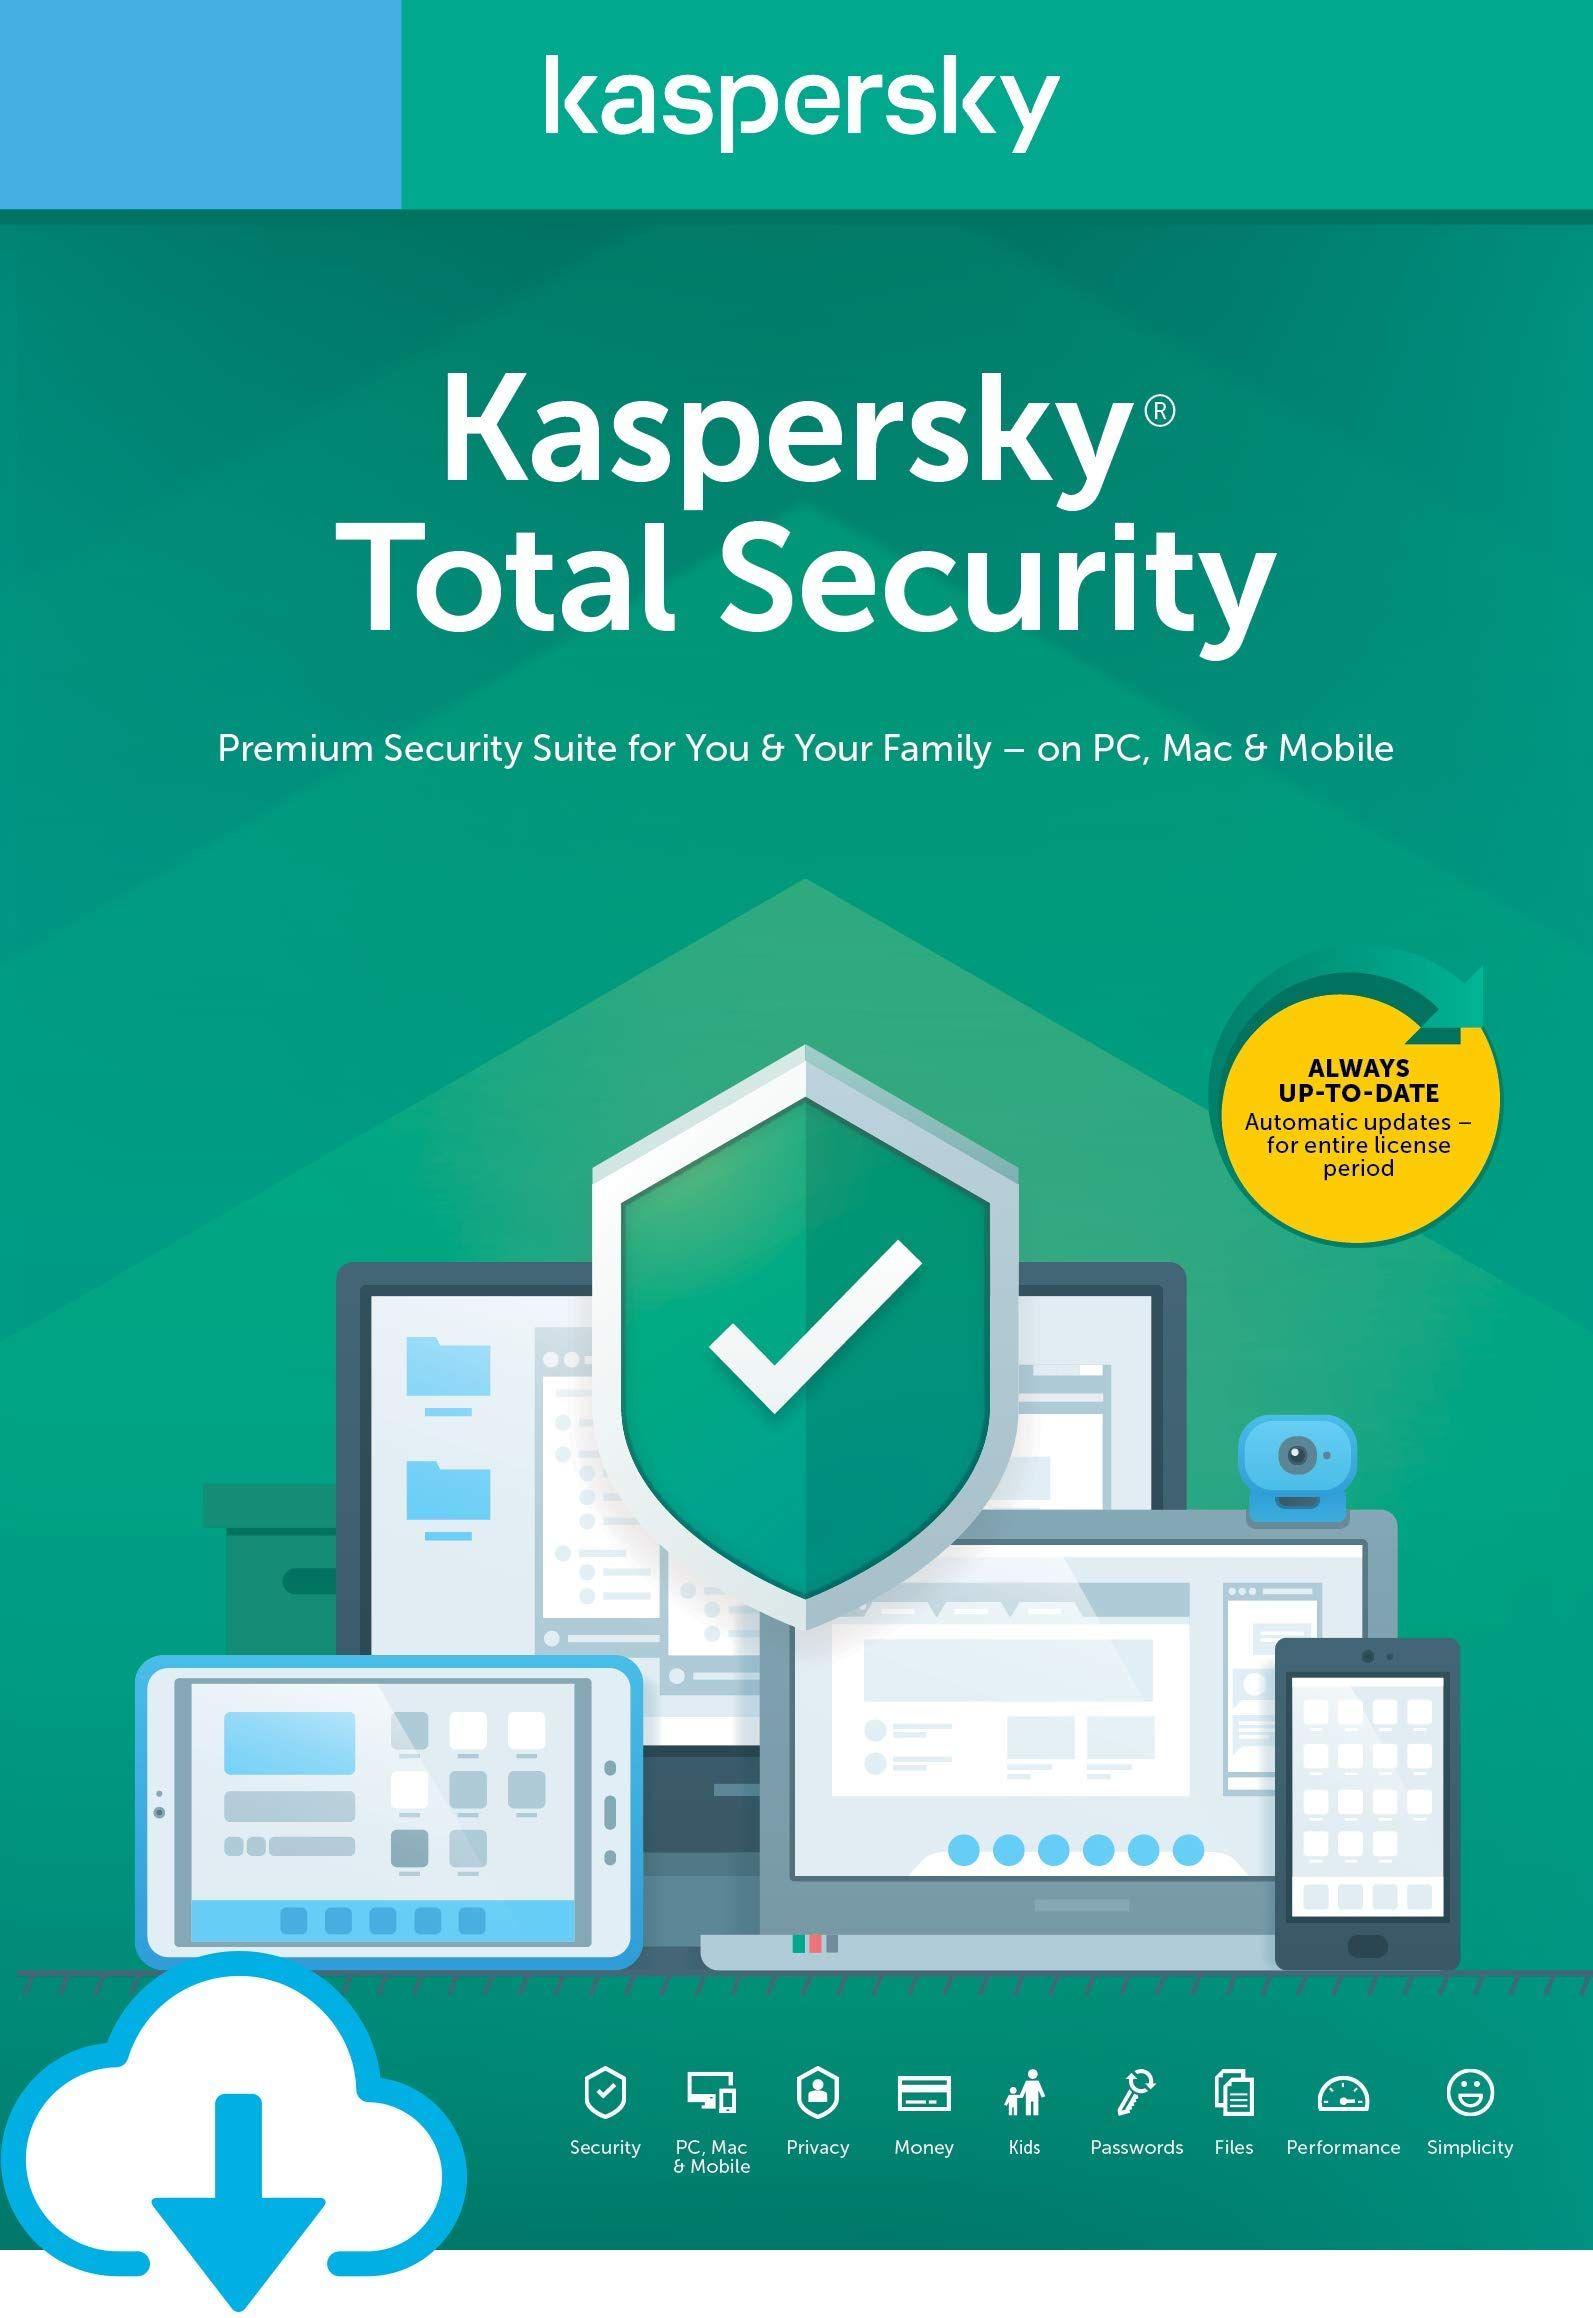 b618b2fc595dd2000687b643ffd6e025 - Does Kaspersky Total Security Have Vpn